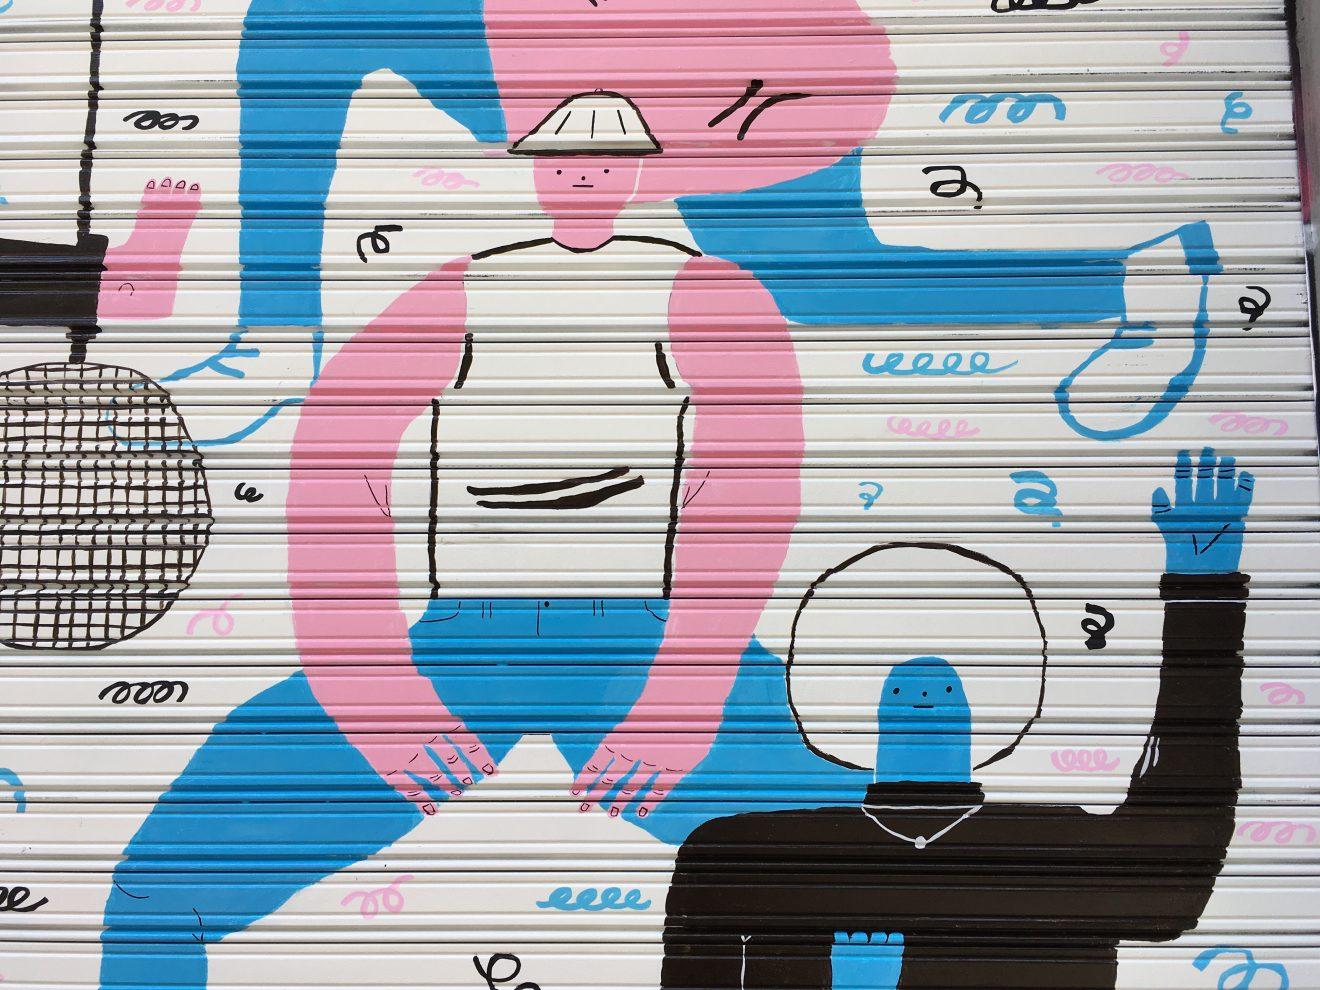 tiger mural3.jpg